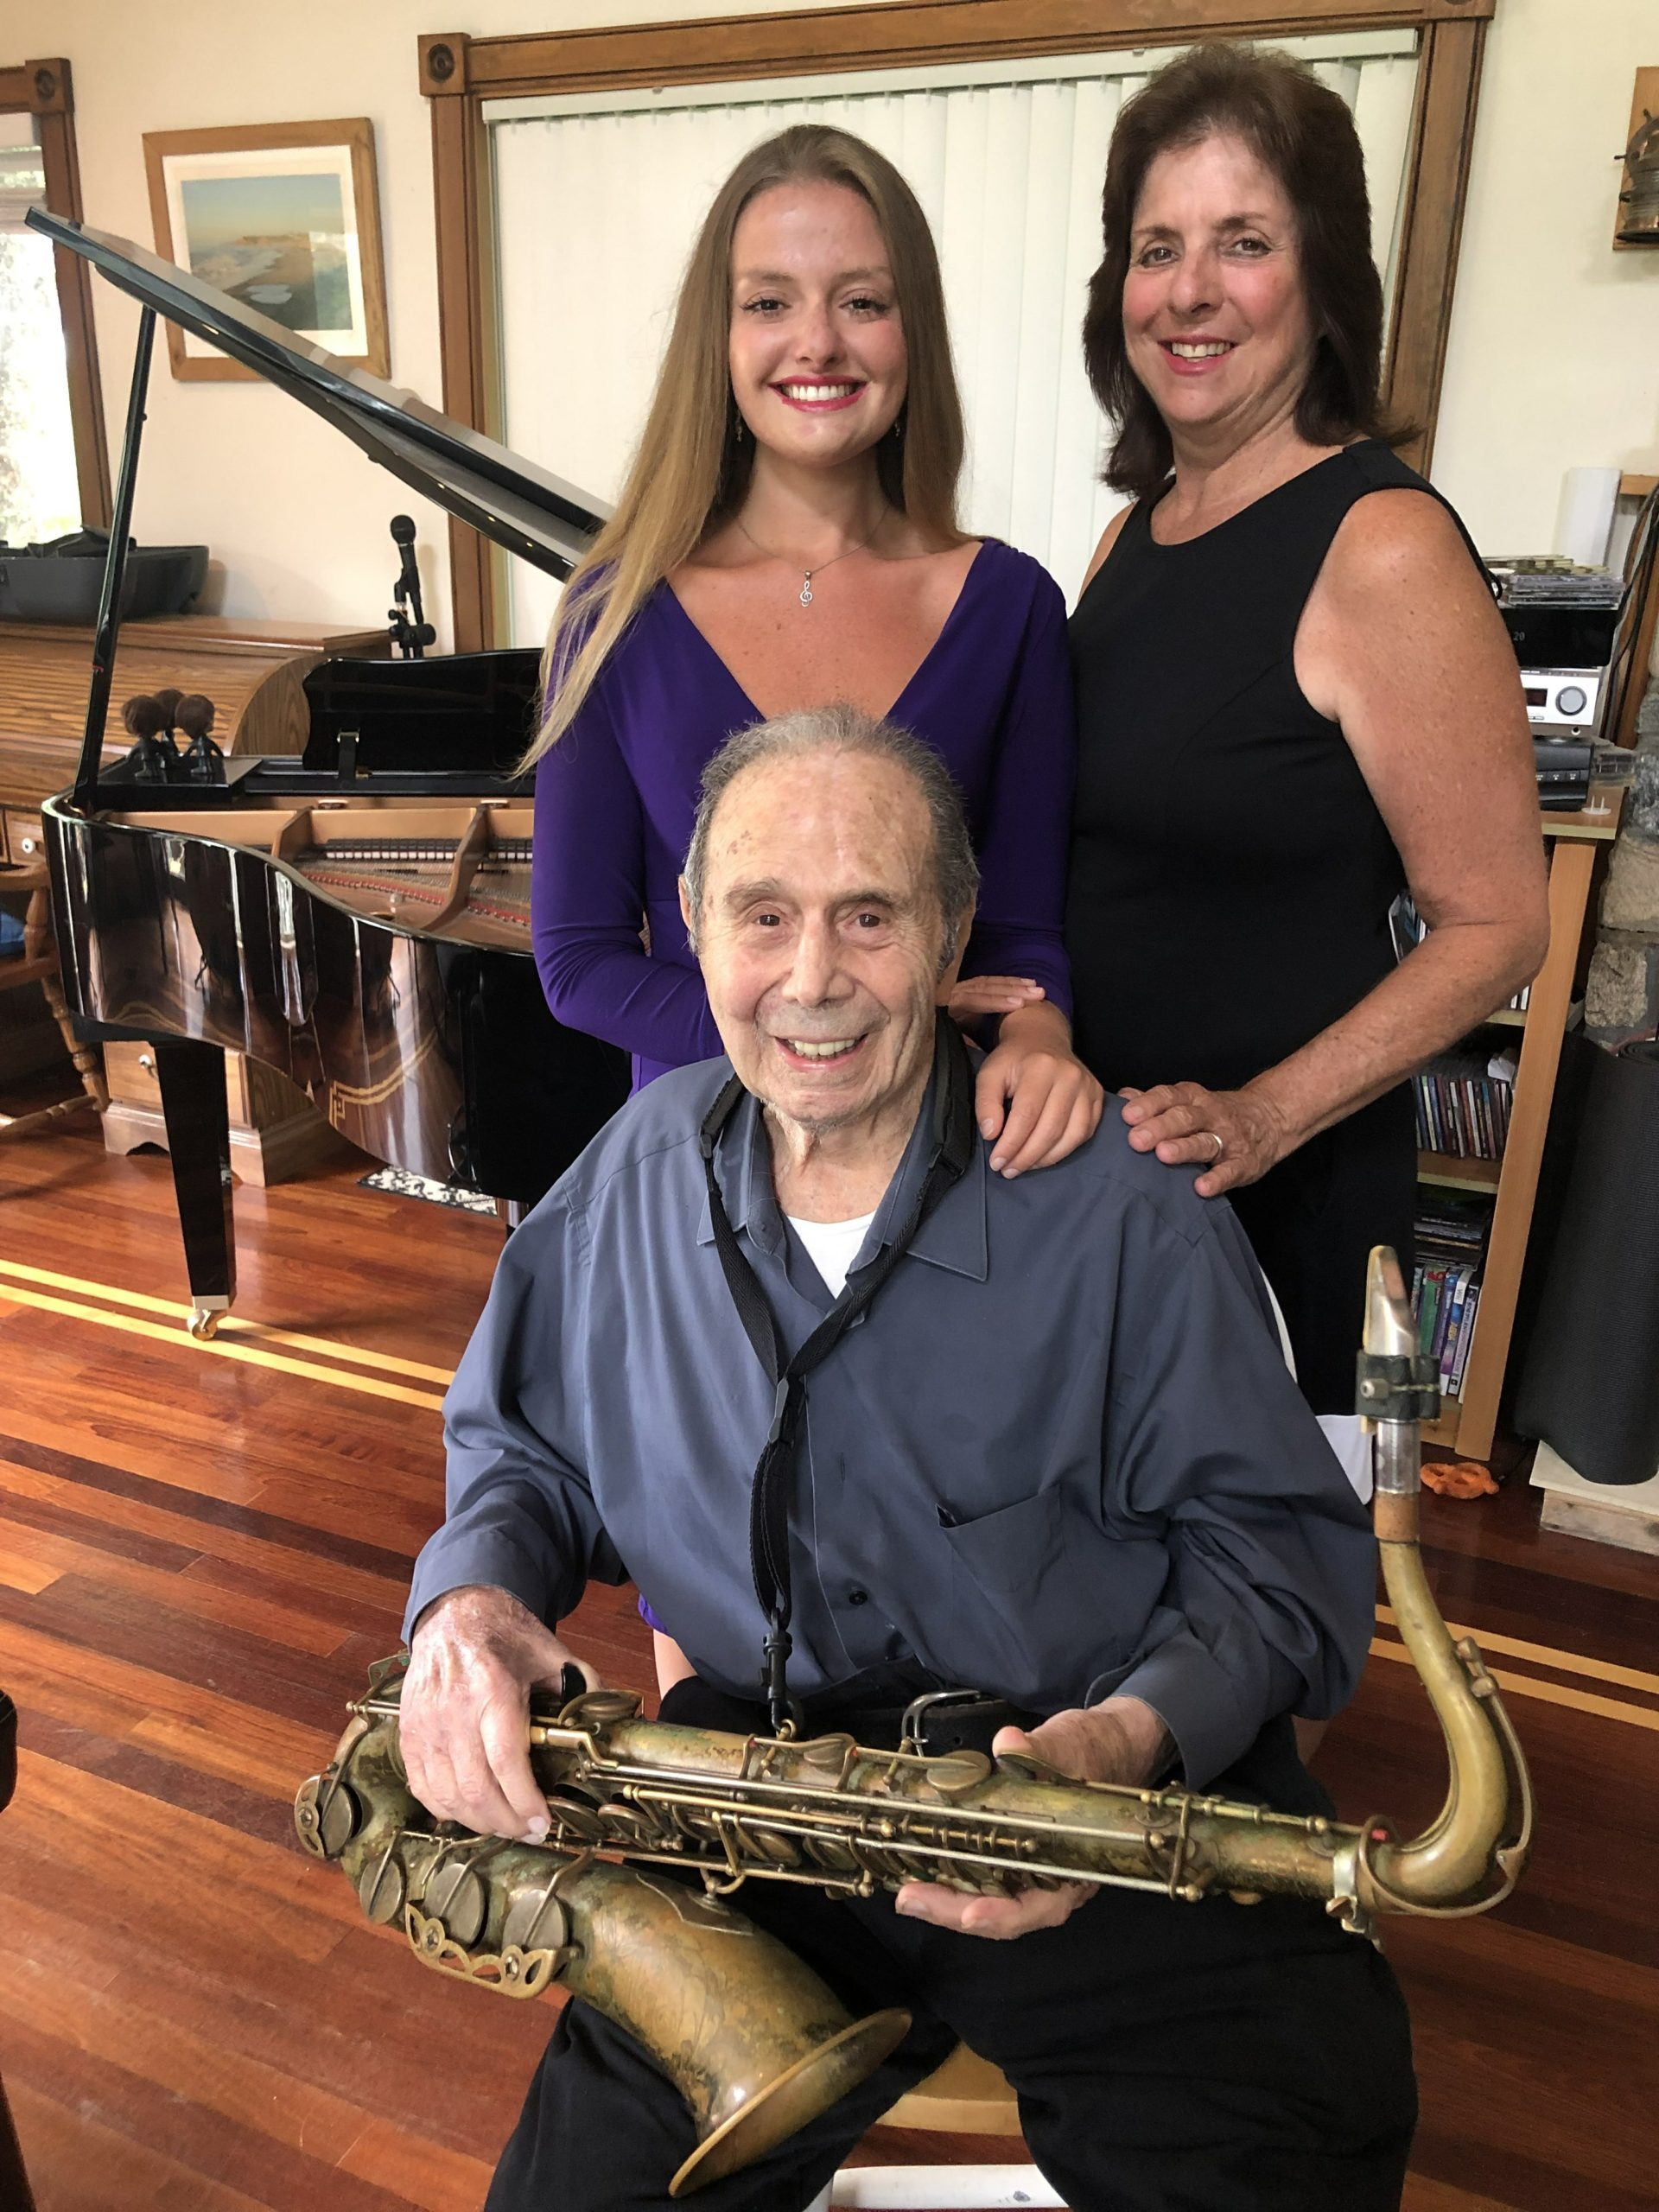 Pat DeRosa, 99, with his daughter, Patricia DeRosa Padden and his granddaughter, Nicole DeRosa Padden. CASILIN RILEY